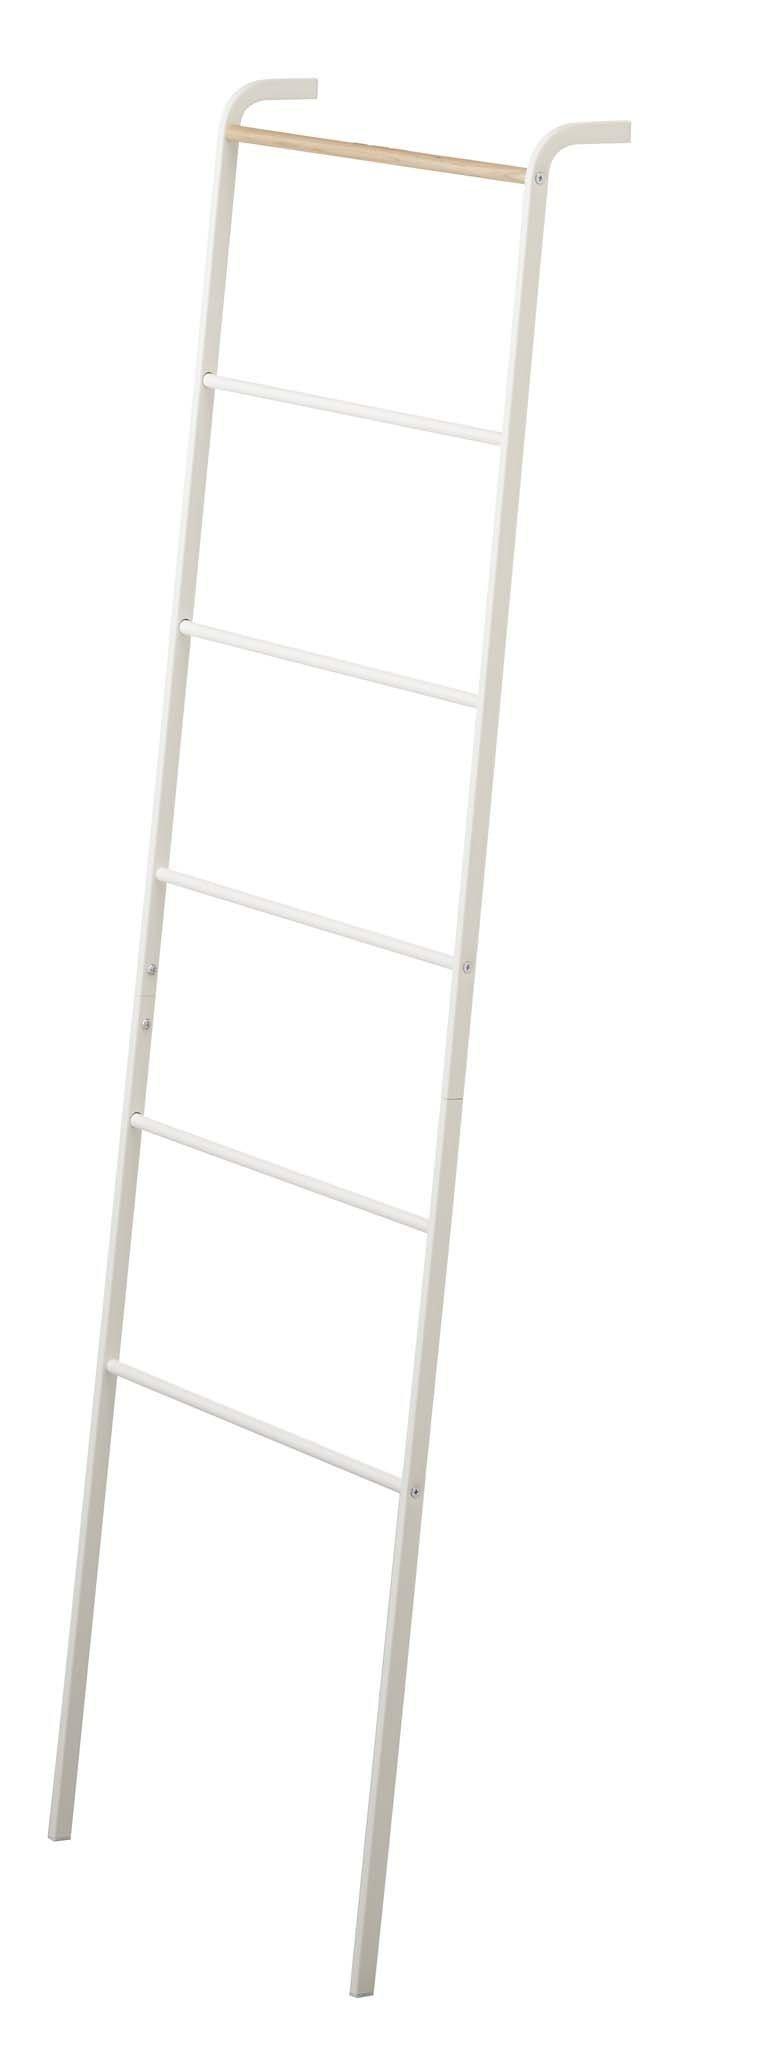 YAMAZAKI home Tower Leaning Ladder Rack White